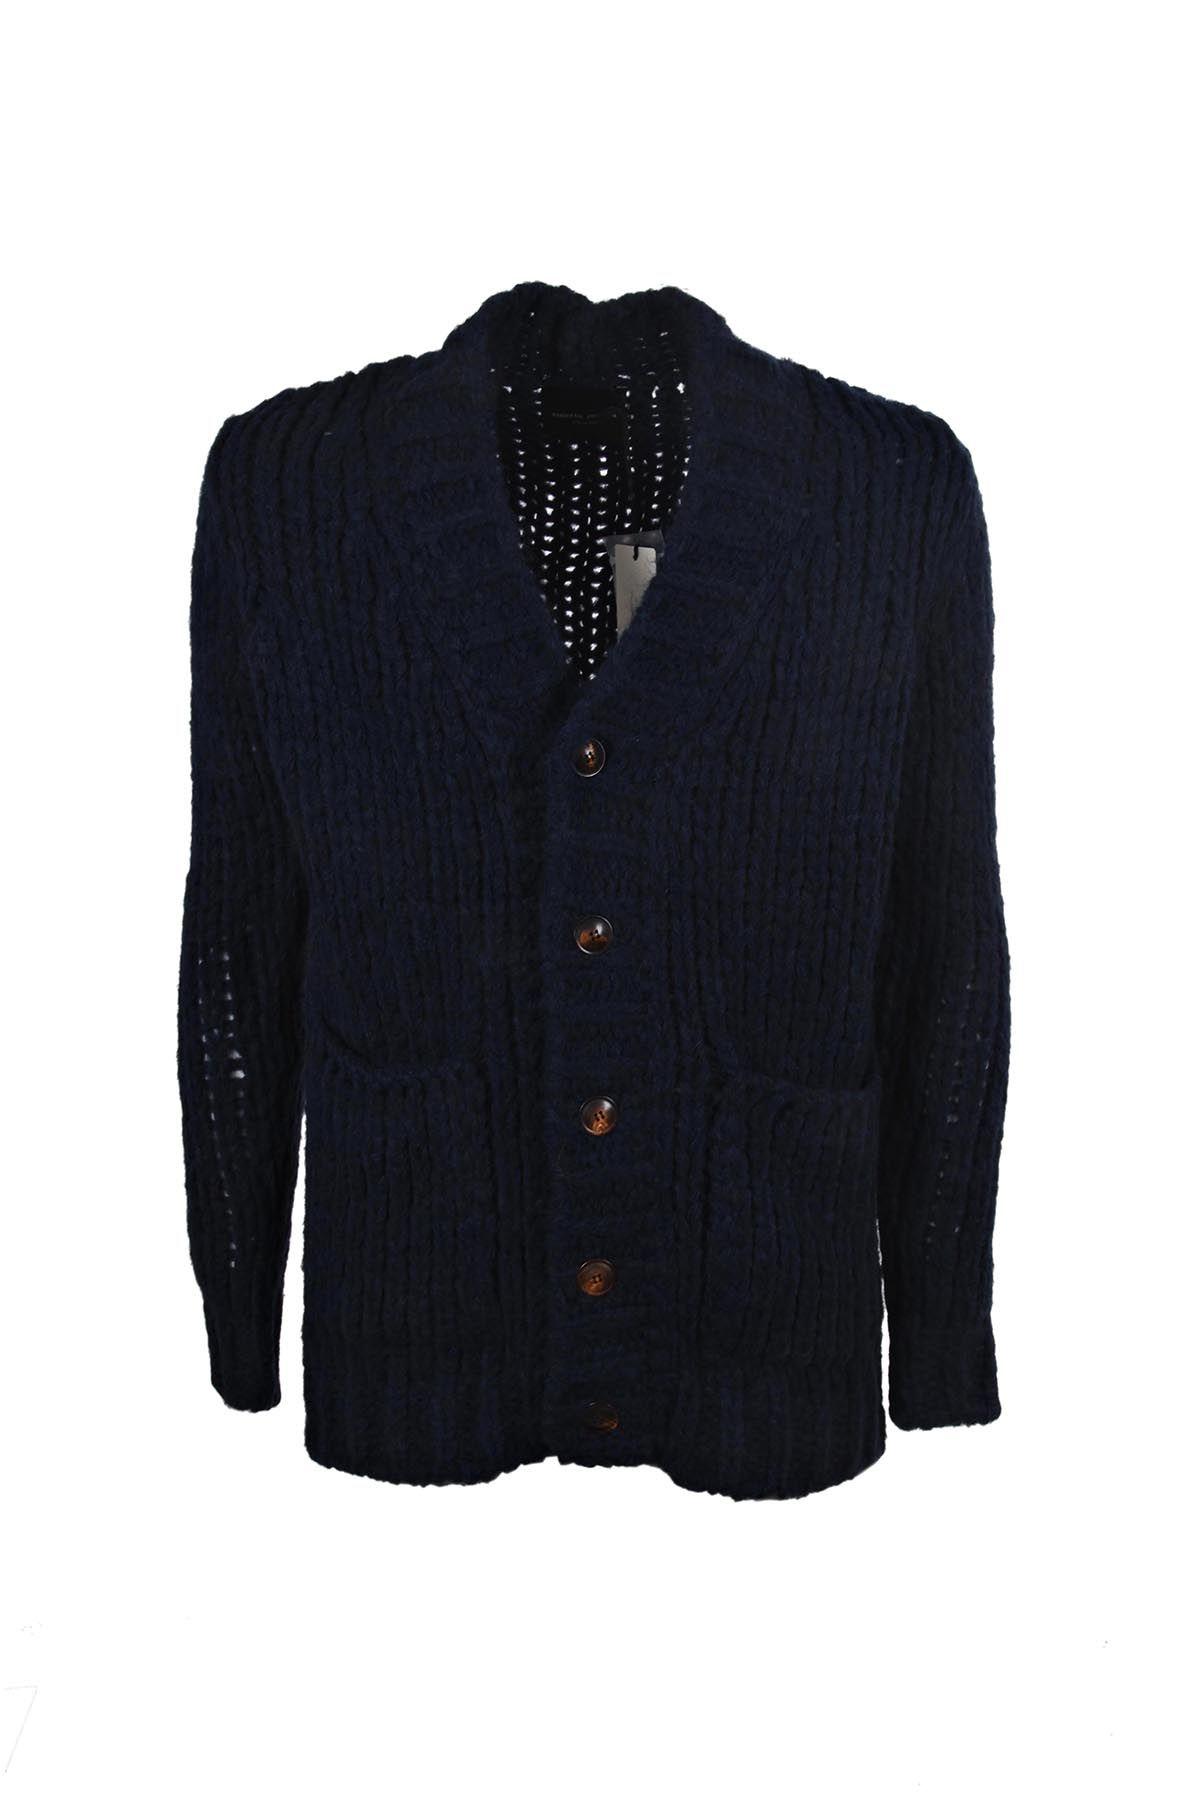 Roberto Collina Chunky Knit Cardigan